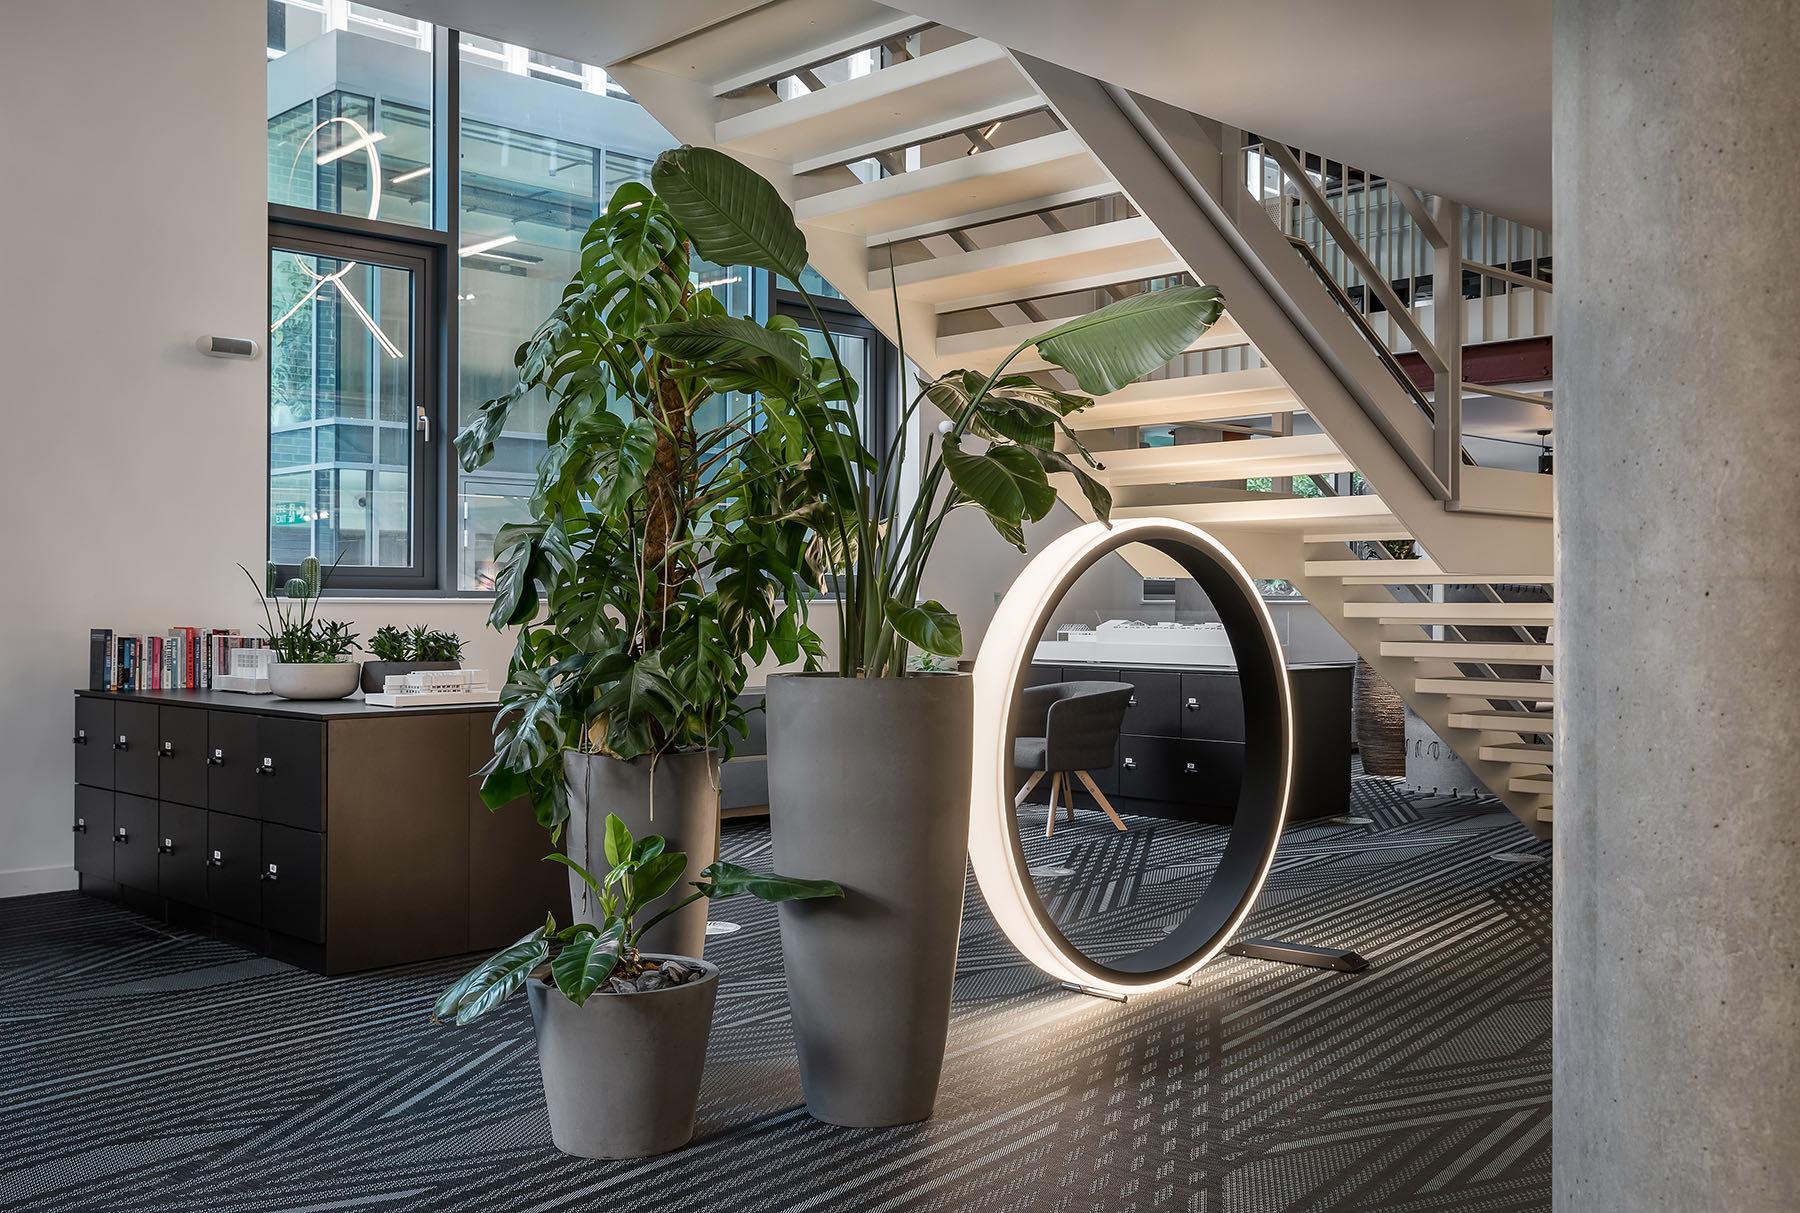 oktra-london-office-2